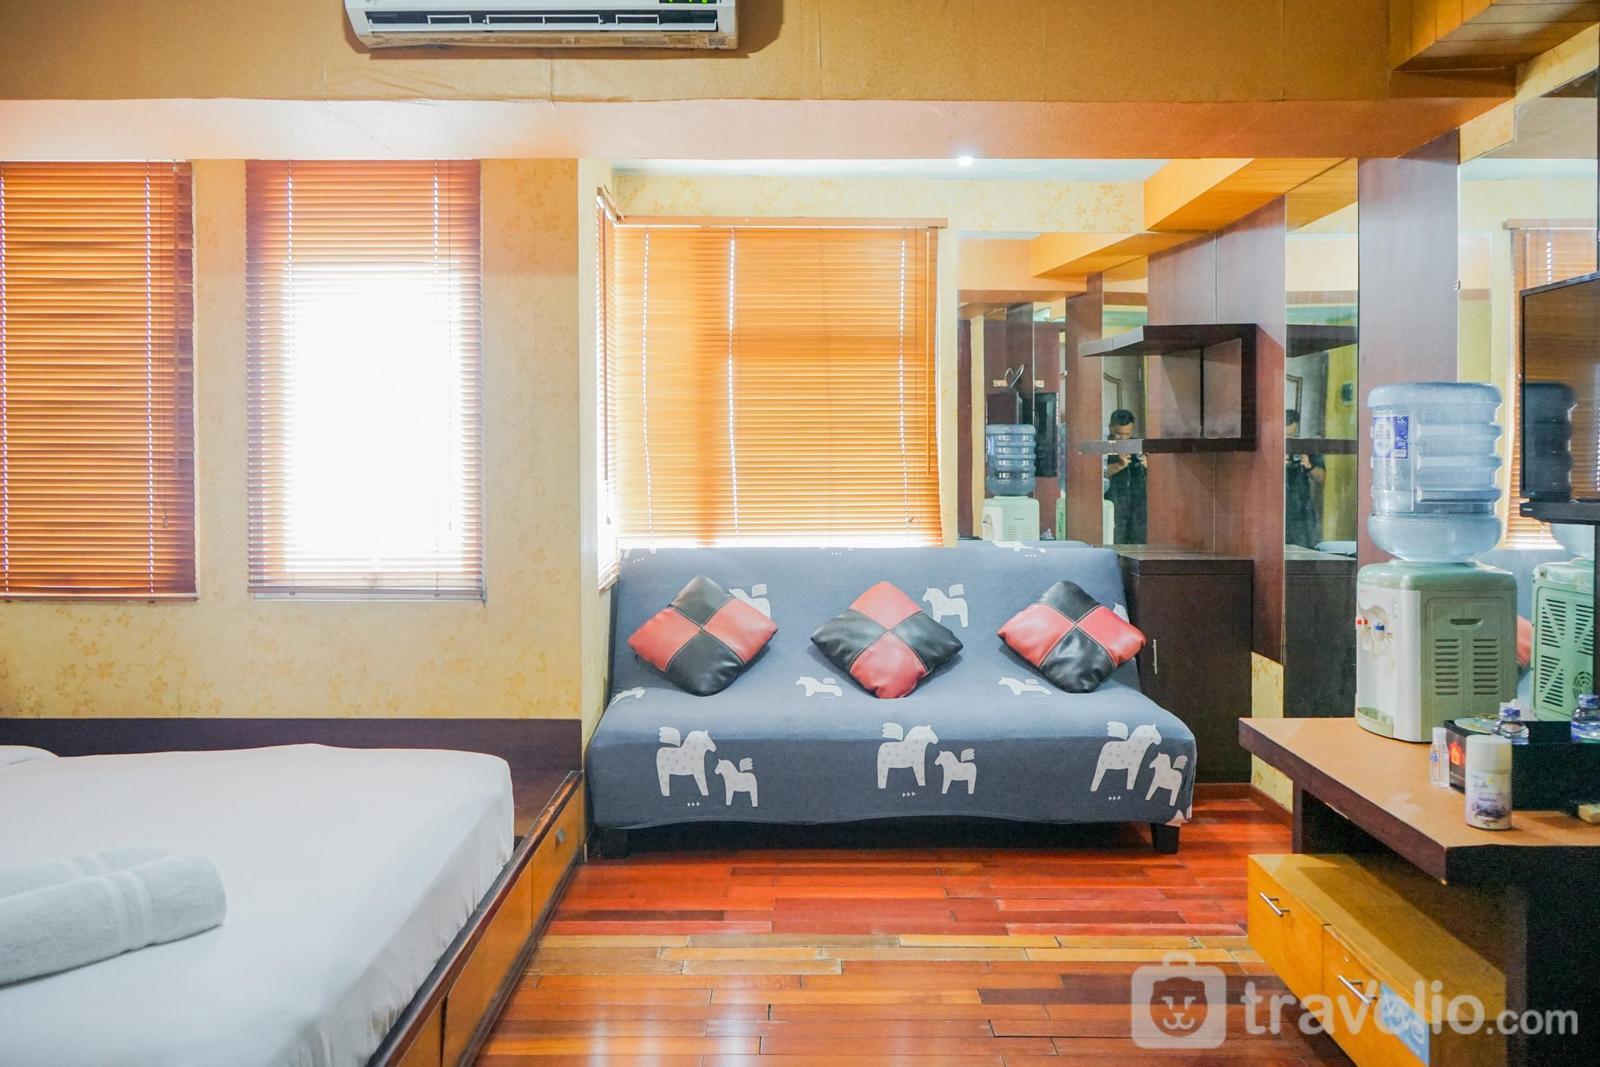 Apartemen Great Western - Simple and Minimalist Studio Apartment at Great Western Resort By Travelio